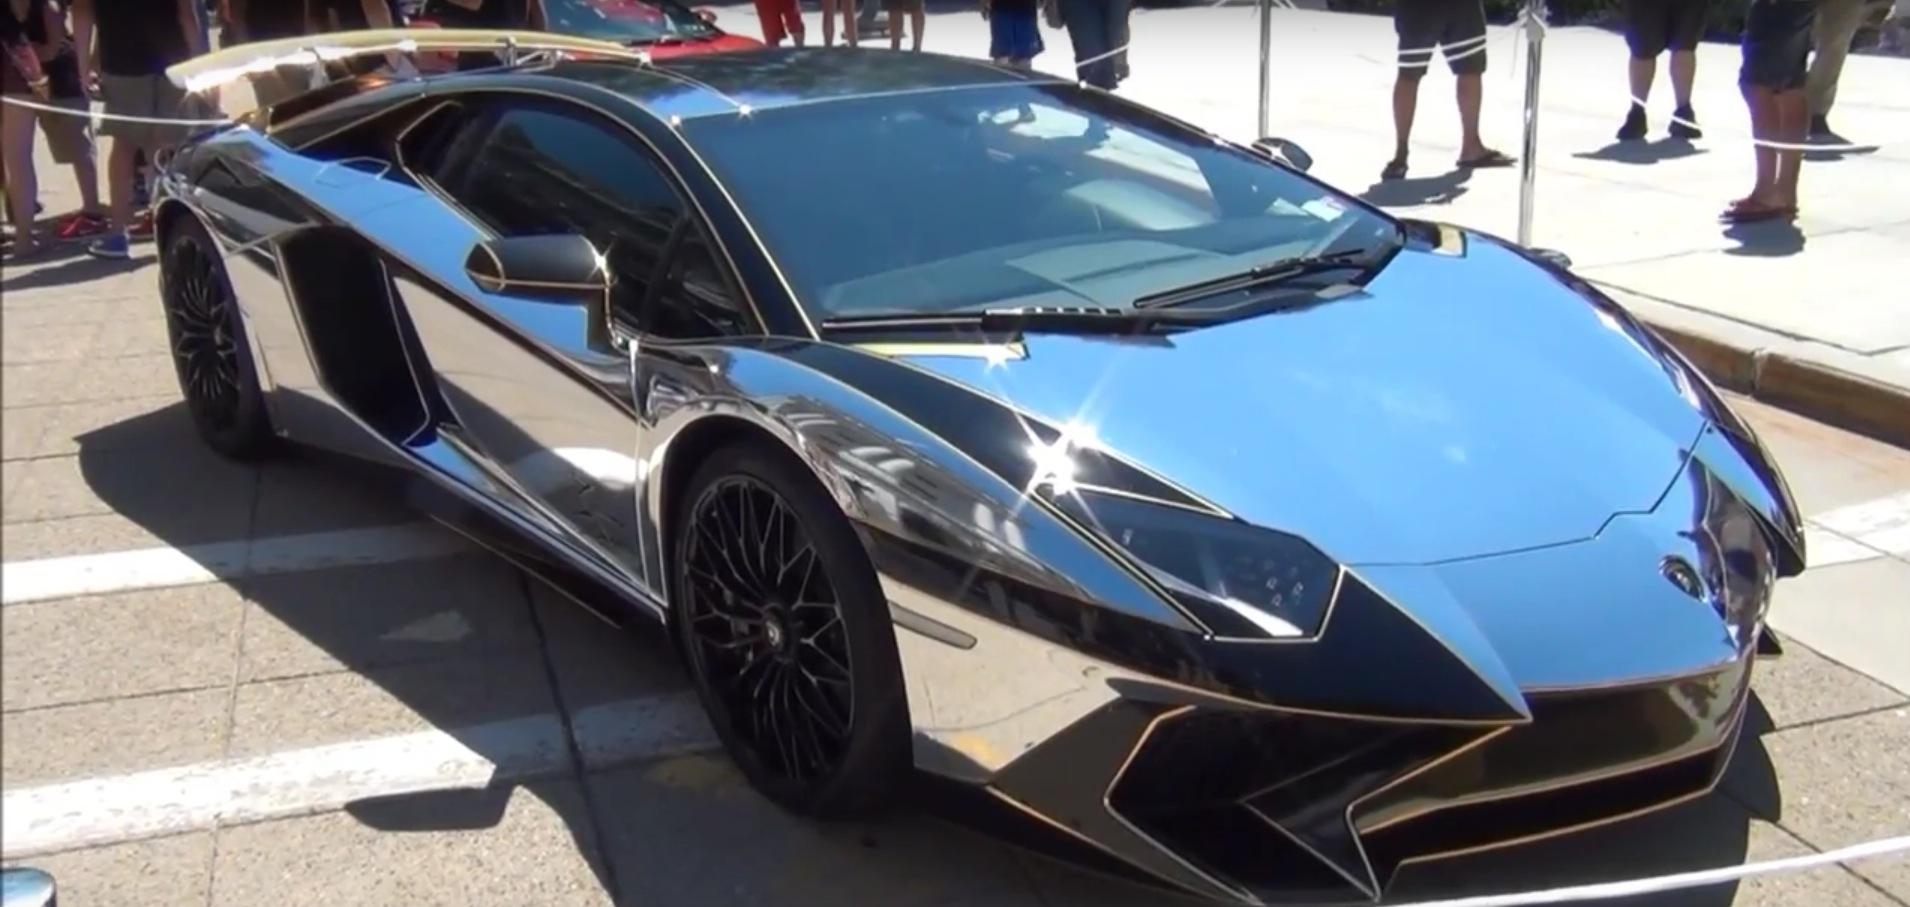 2016 Lamborghini Aventador Sv Gets Chrome Gold Wrap For